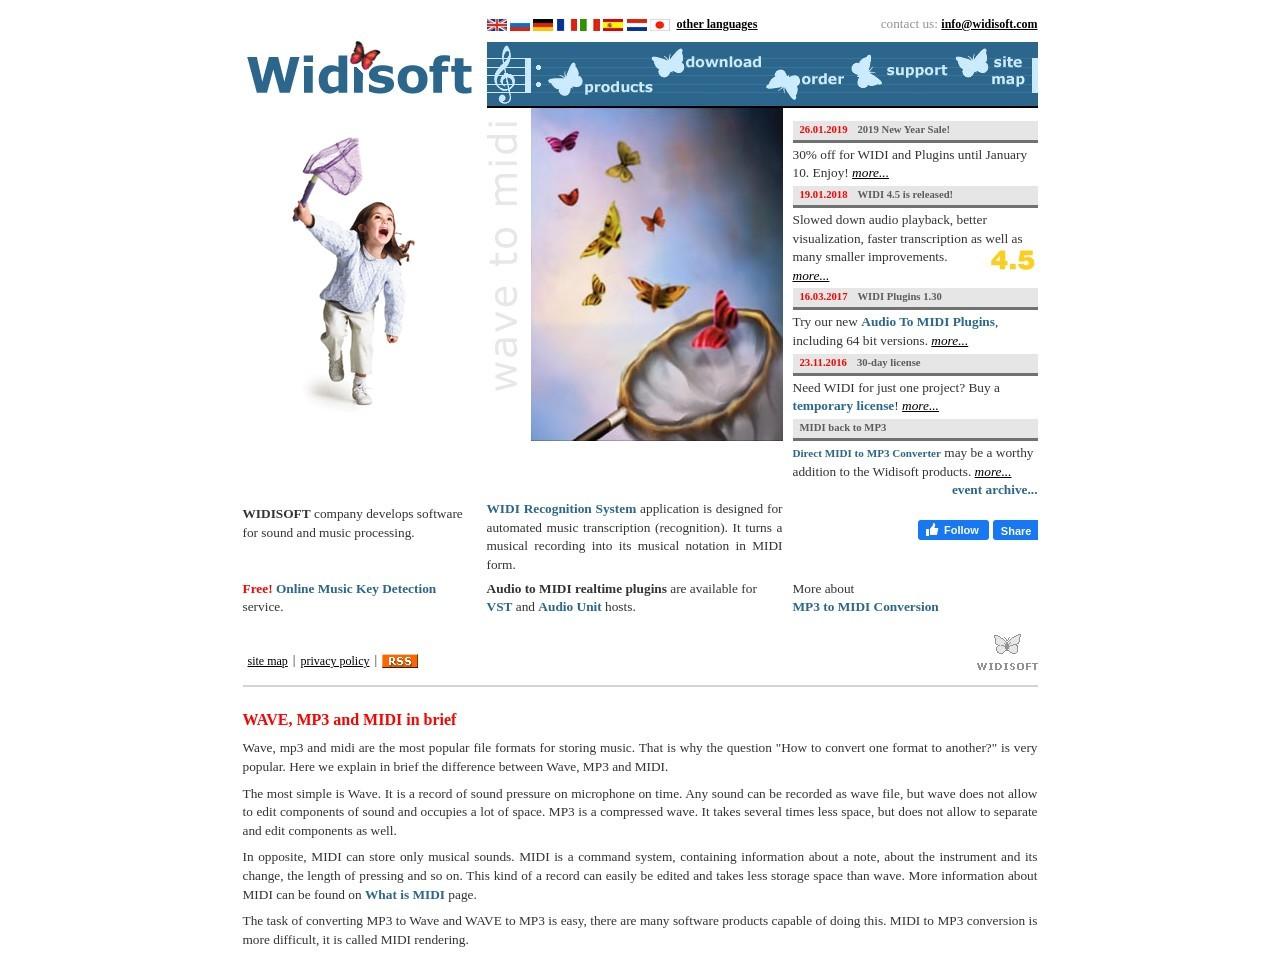 Widisoft